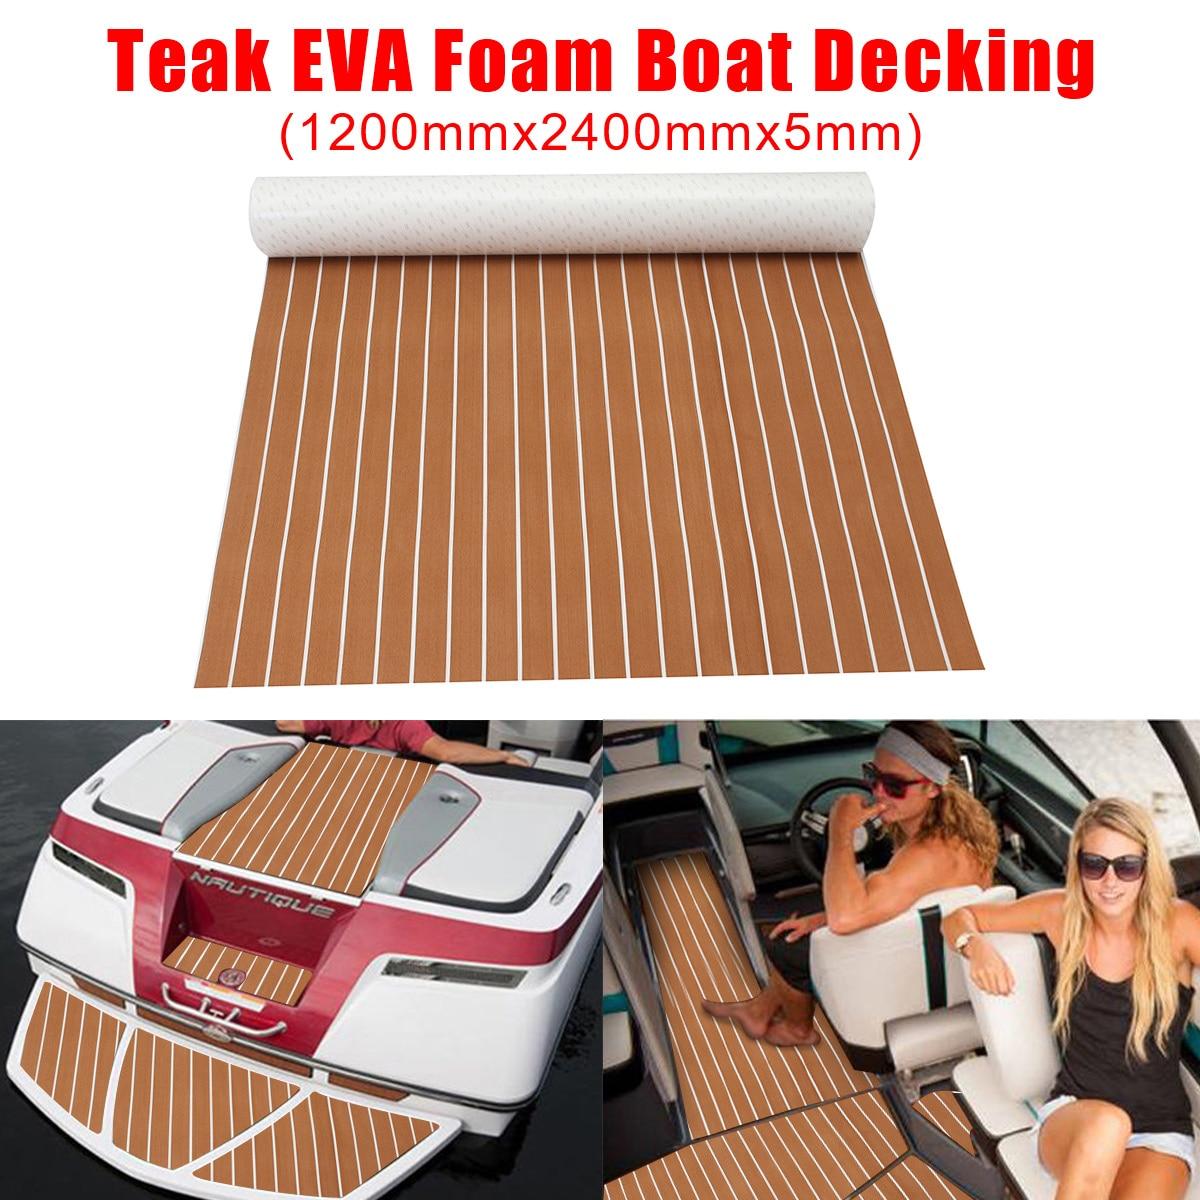 1200x2400x5mm Self Adhesive Teak Flooring EVA Foam Teak Sheet Teak Boat Decking Marine Car Yacht Floor Mat Synthetic Teak Pad